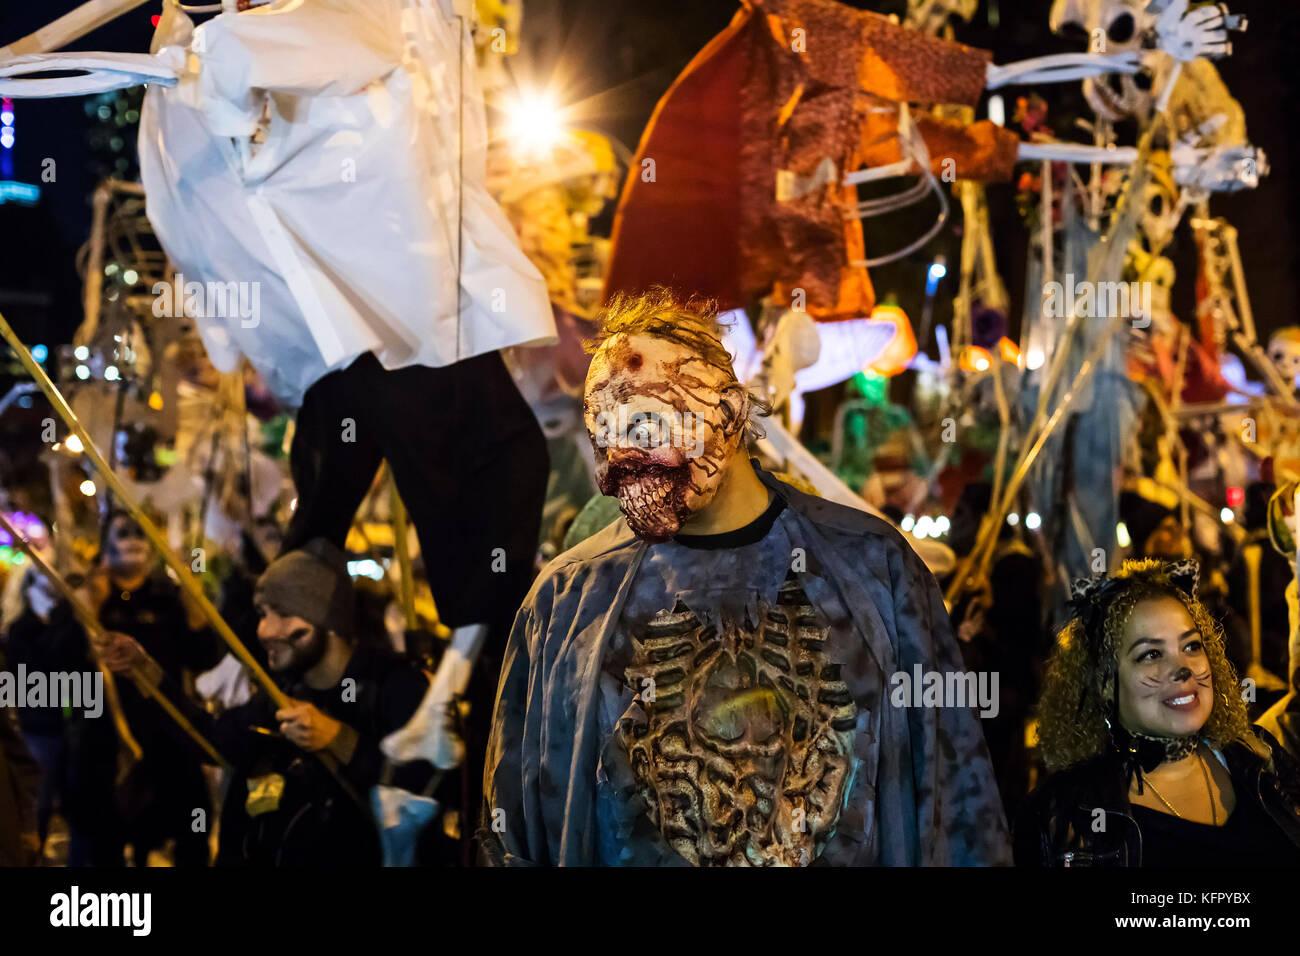 New York, USA. 1st Nov, 2017. New York's annual Village Halloween ...